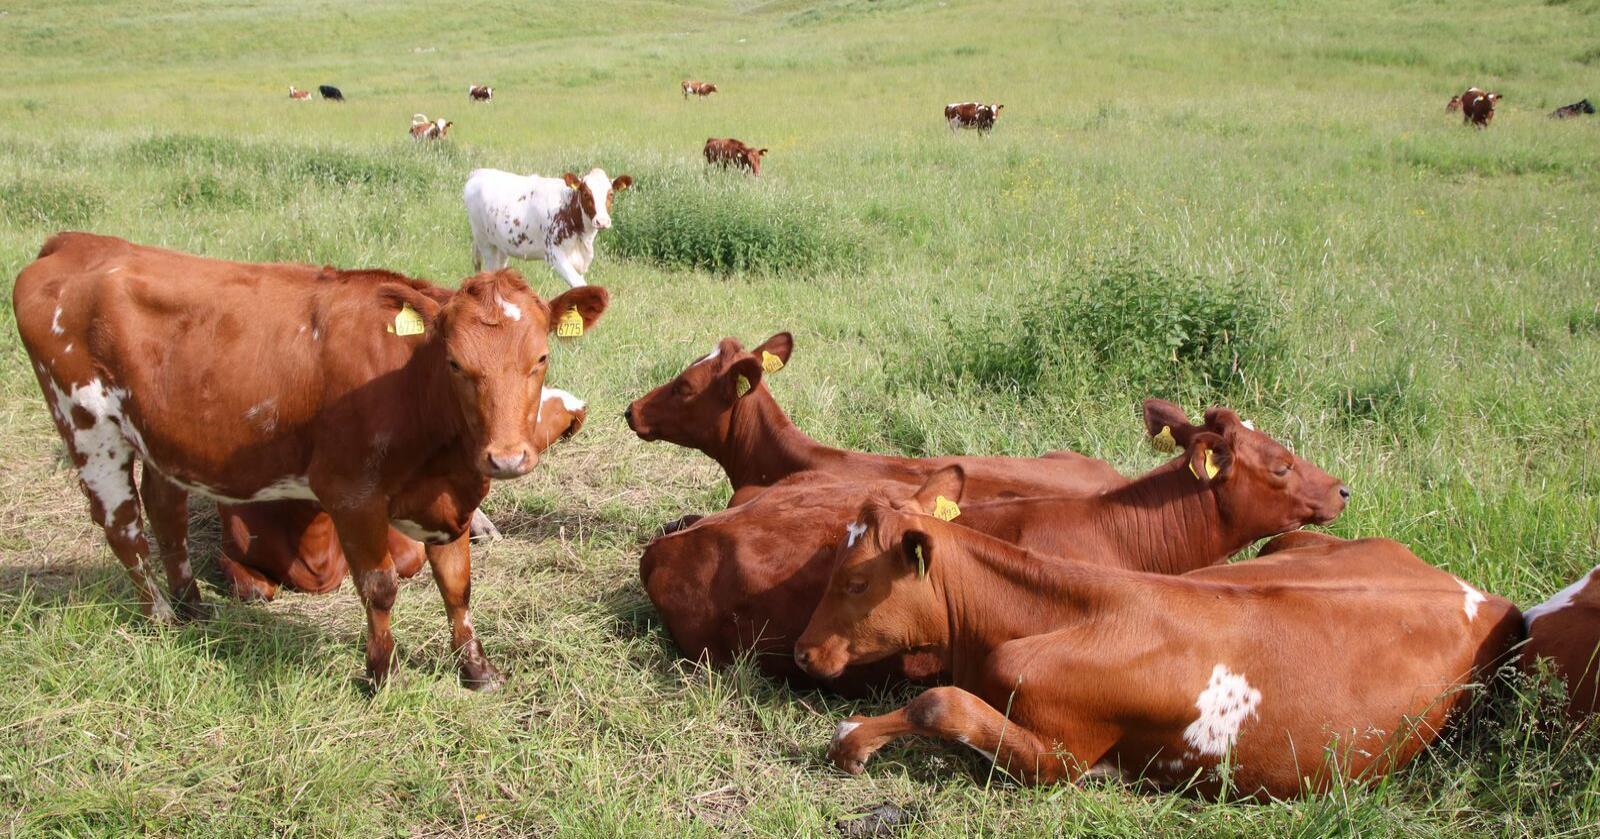 Slutningen om at drøvtyggerne er landbrukets store klimaproblem, er grovt urimelig mot både bonden og drøvtyggerne, mener Rose Bergslid og Arnar Lyche. Her sees storfe på norsk beite. Foto: Karl Erik Berge